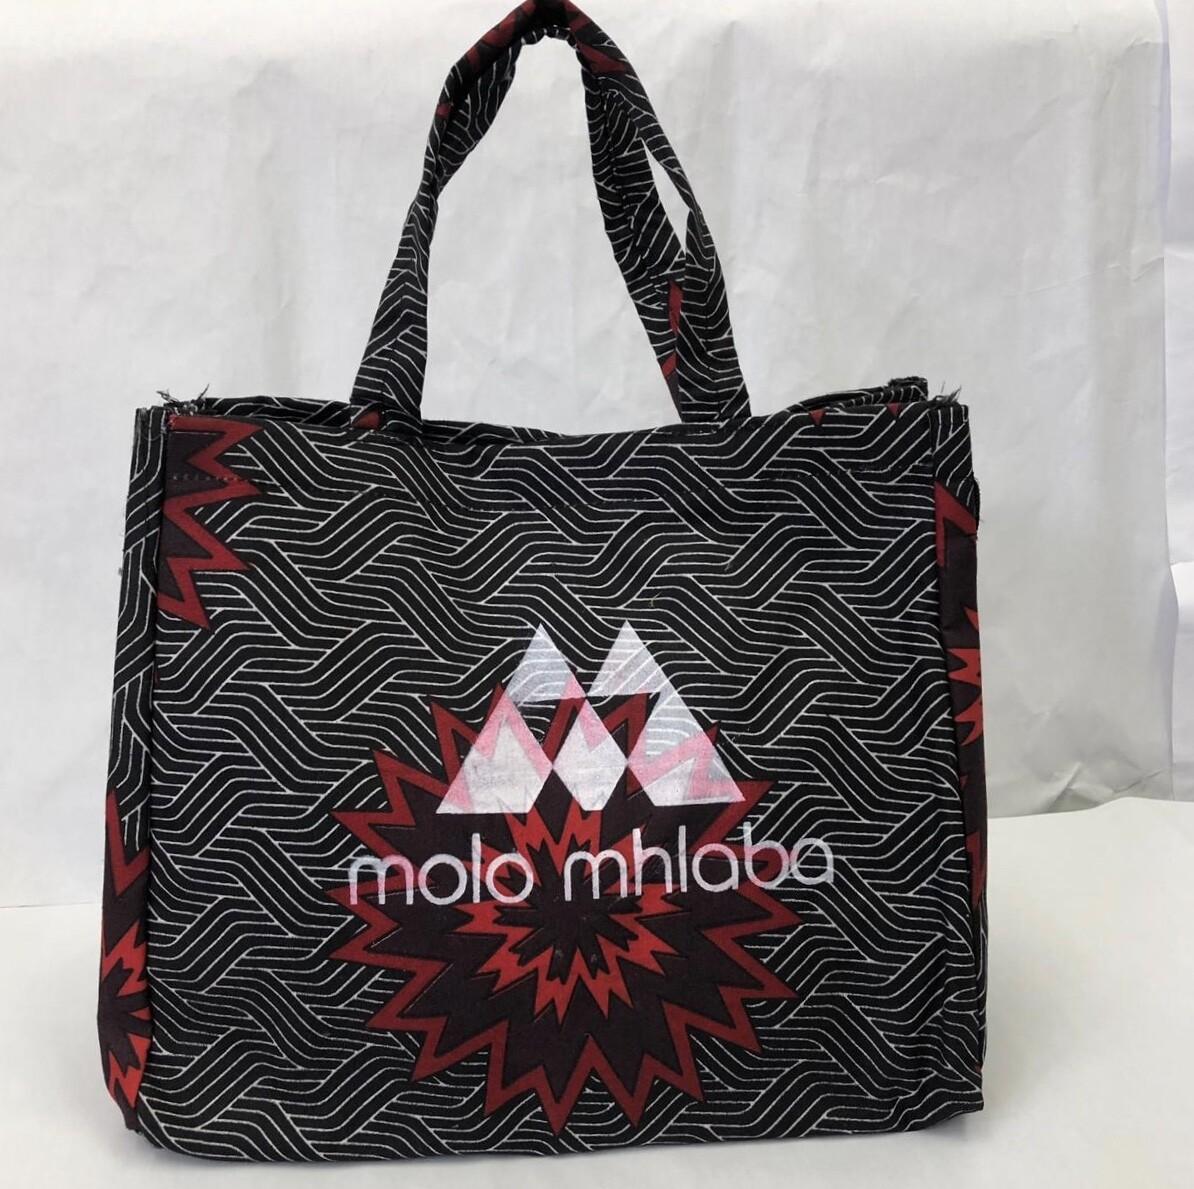 Geometric red/black pattern handbag